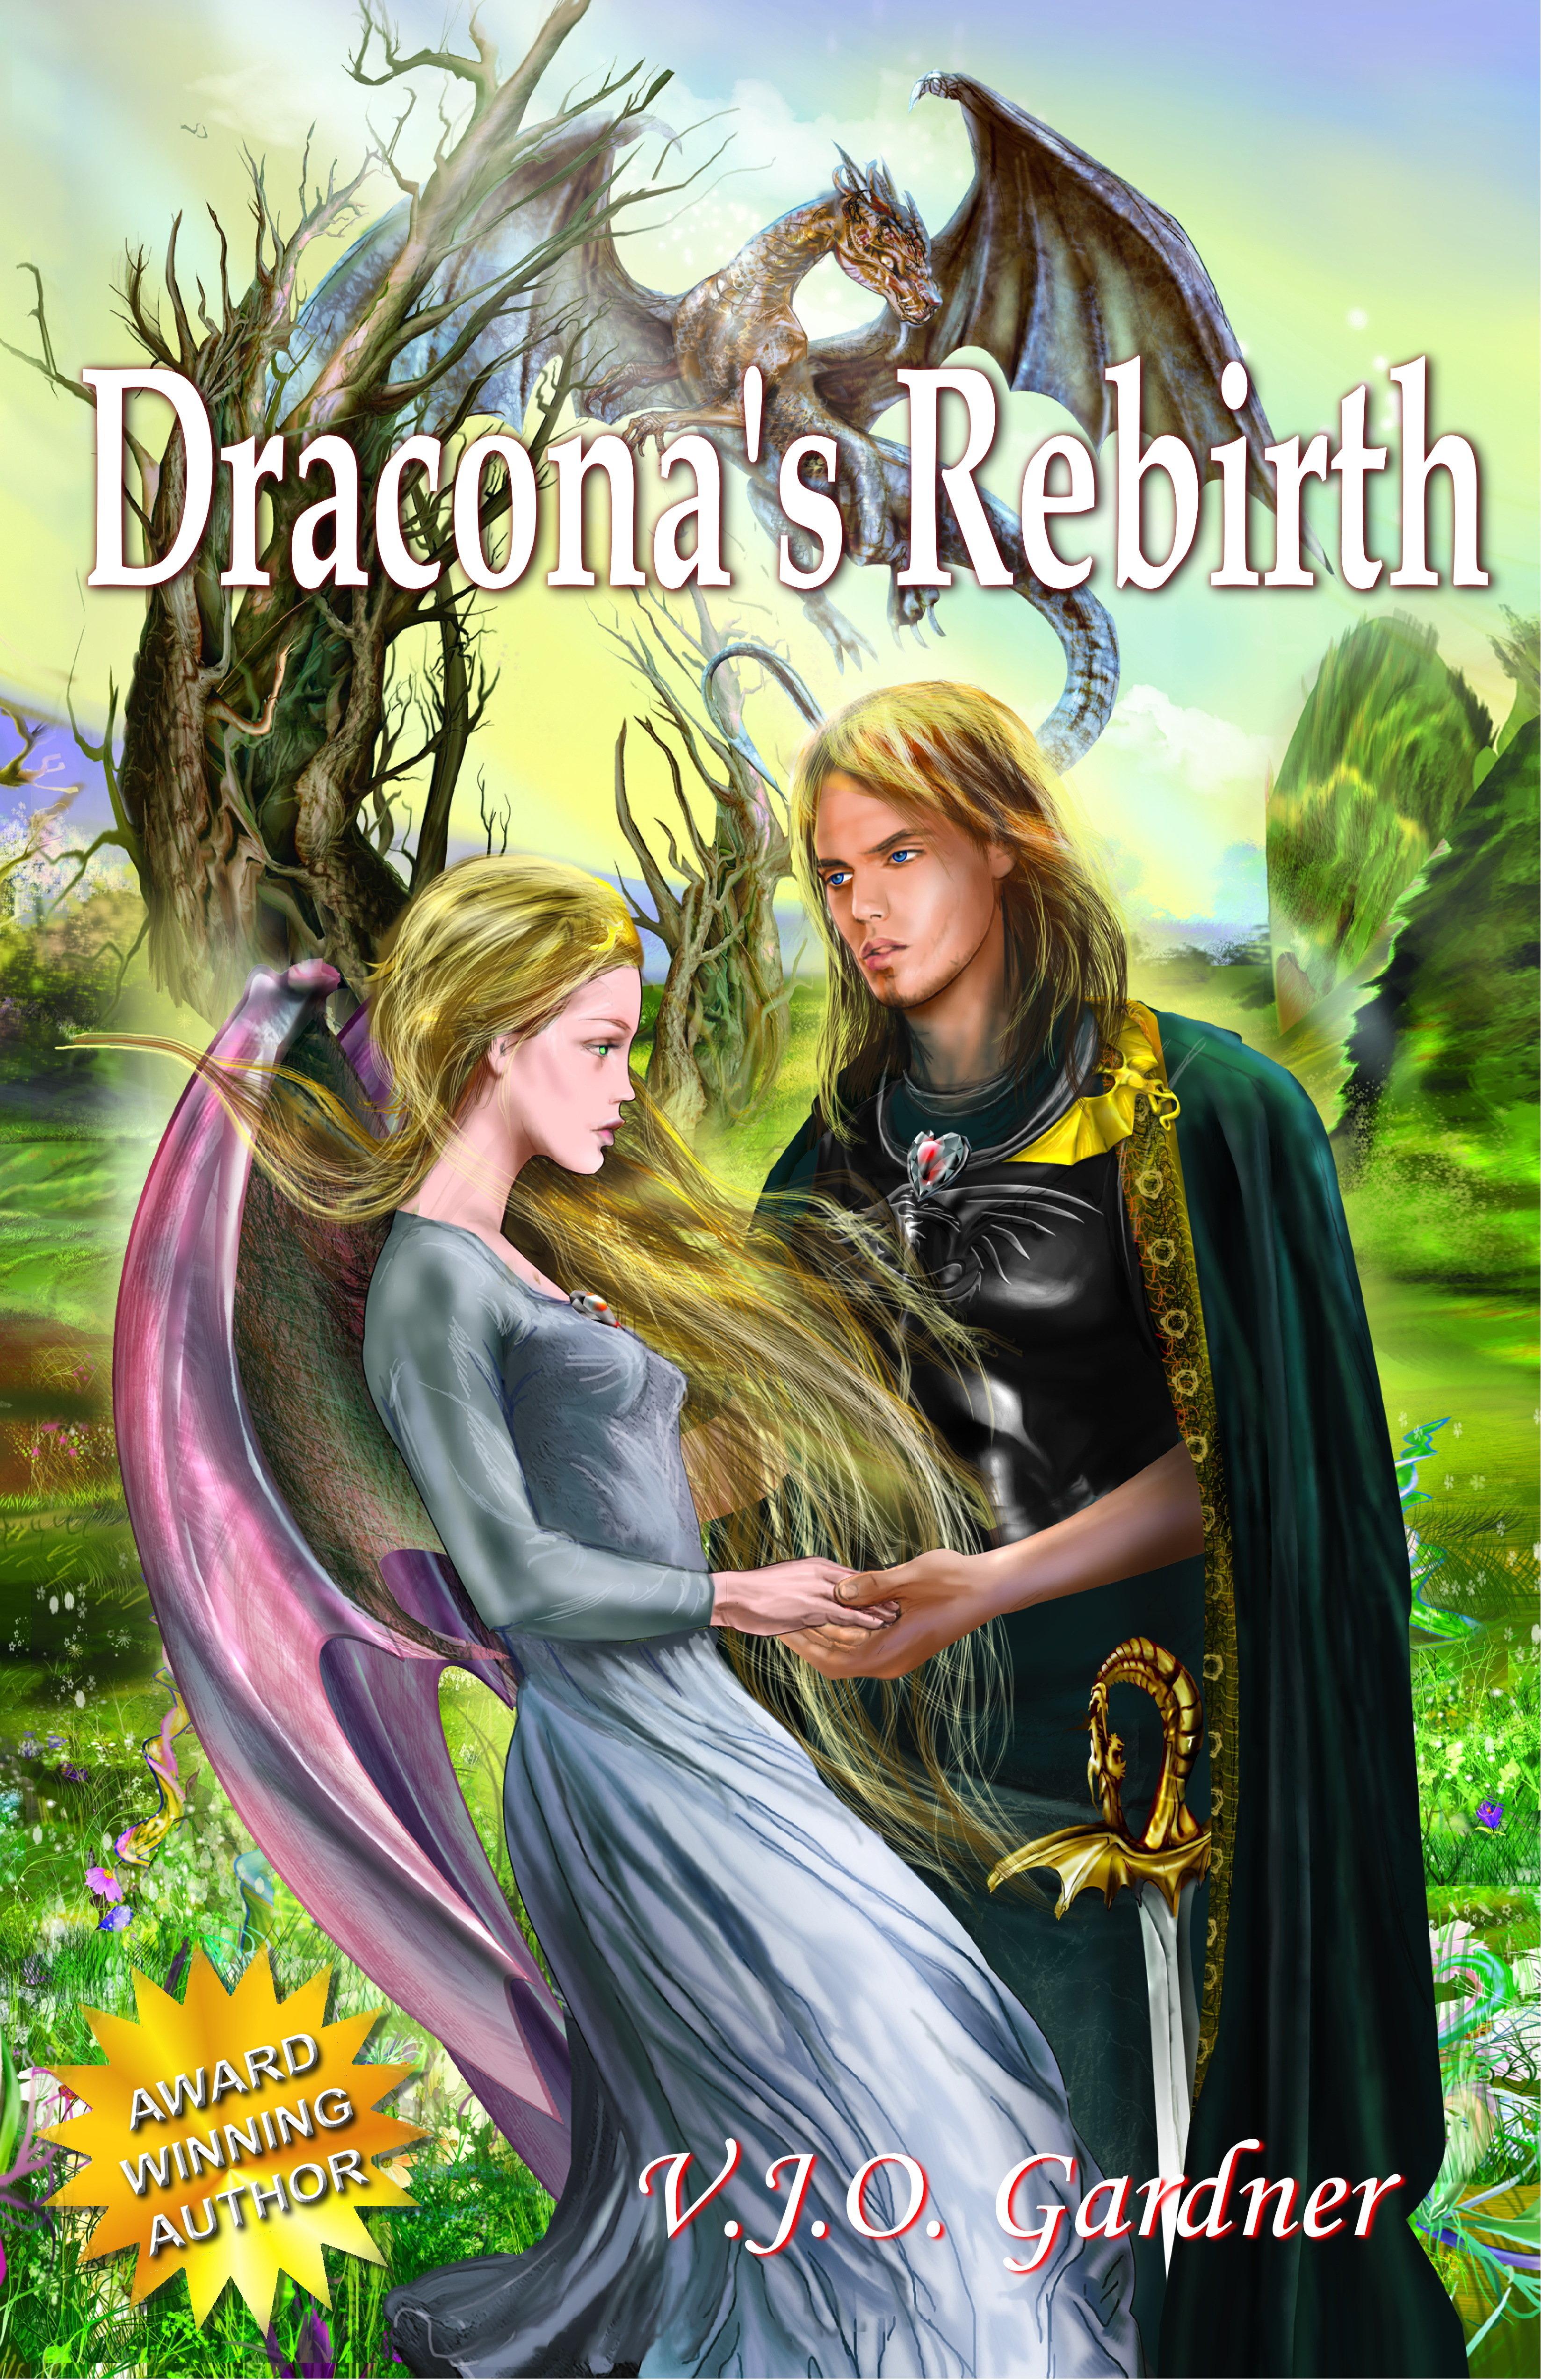 Dracona's Rebirth 00004